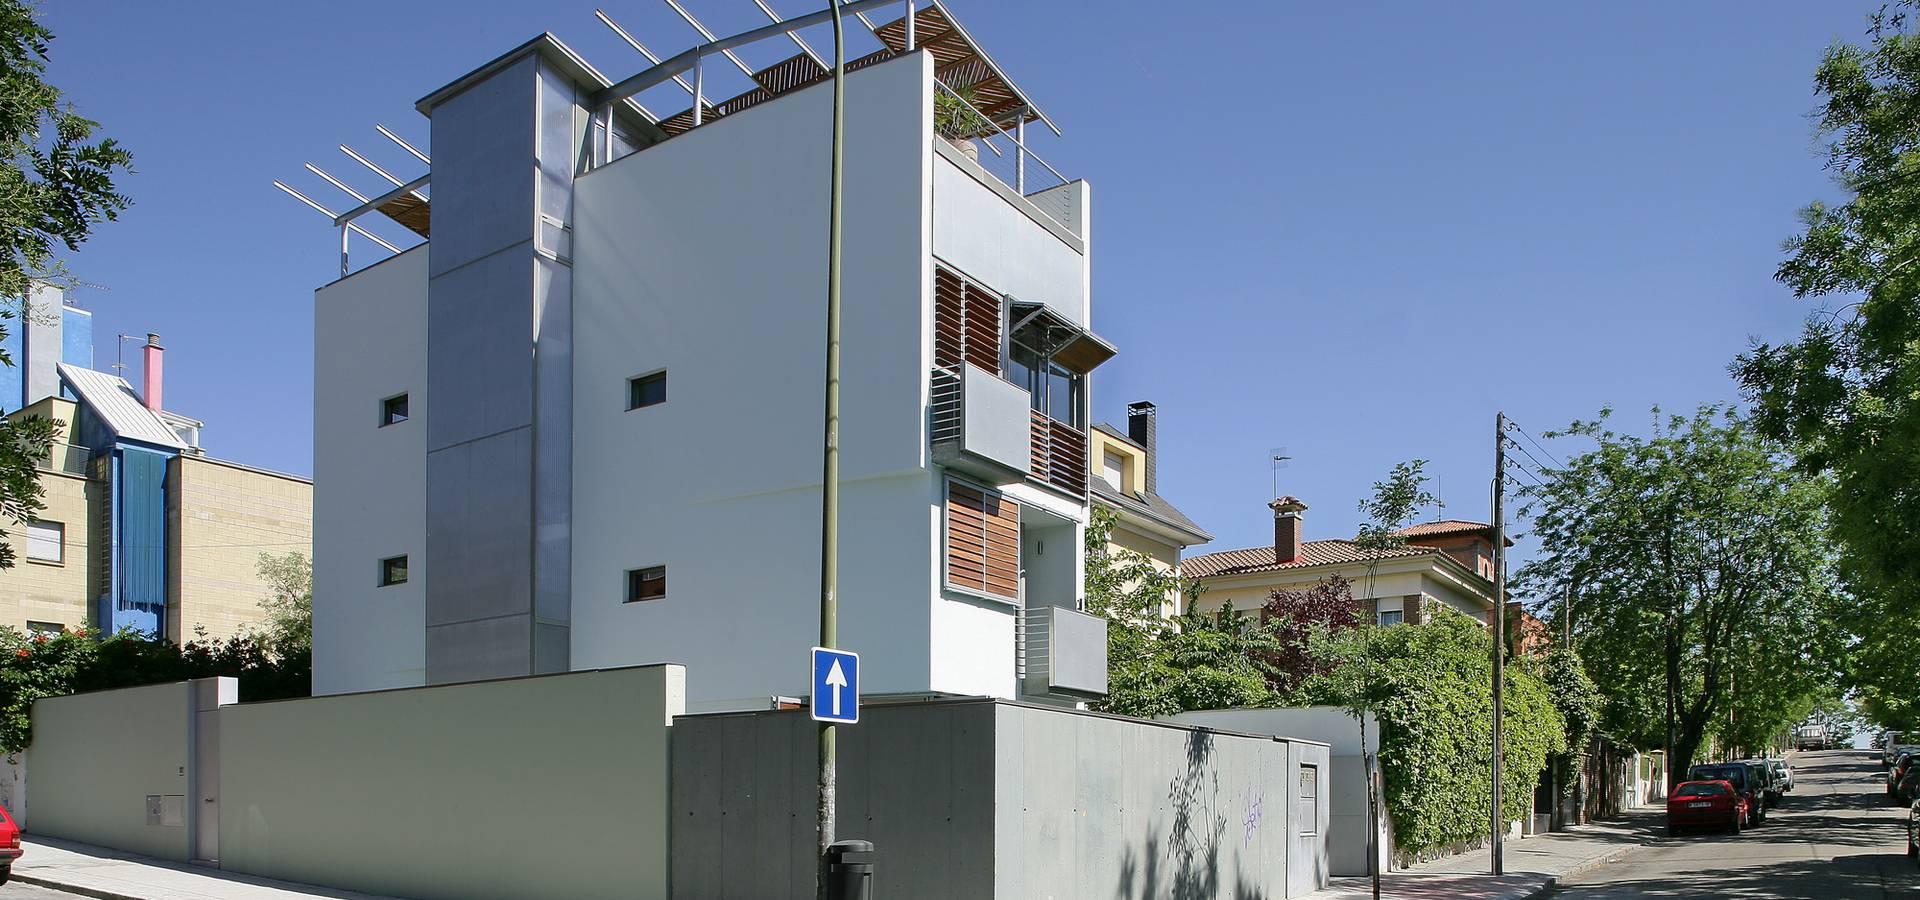 Arq jiliberto malaga arquitectos en m laga homify - Arquitectos en malaga ...